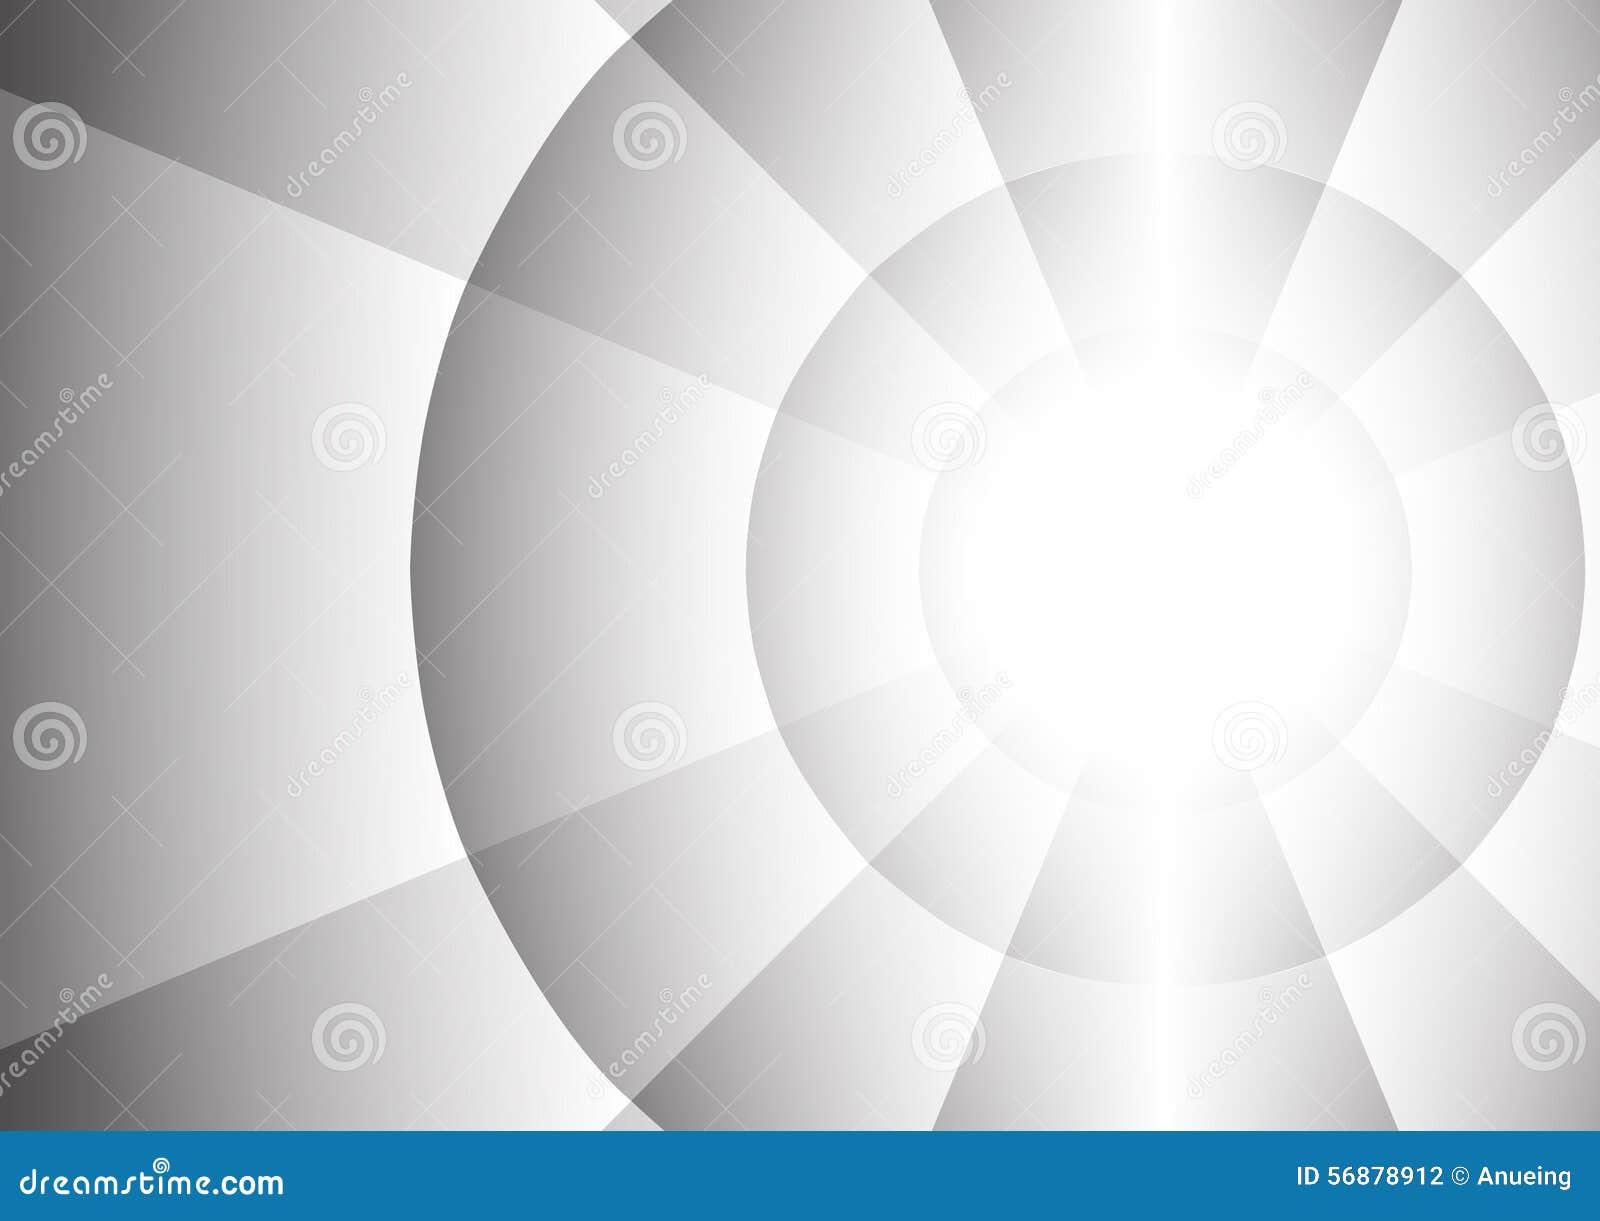 Abstract radius of circle background